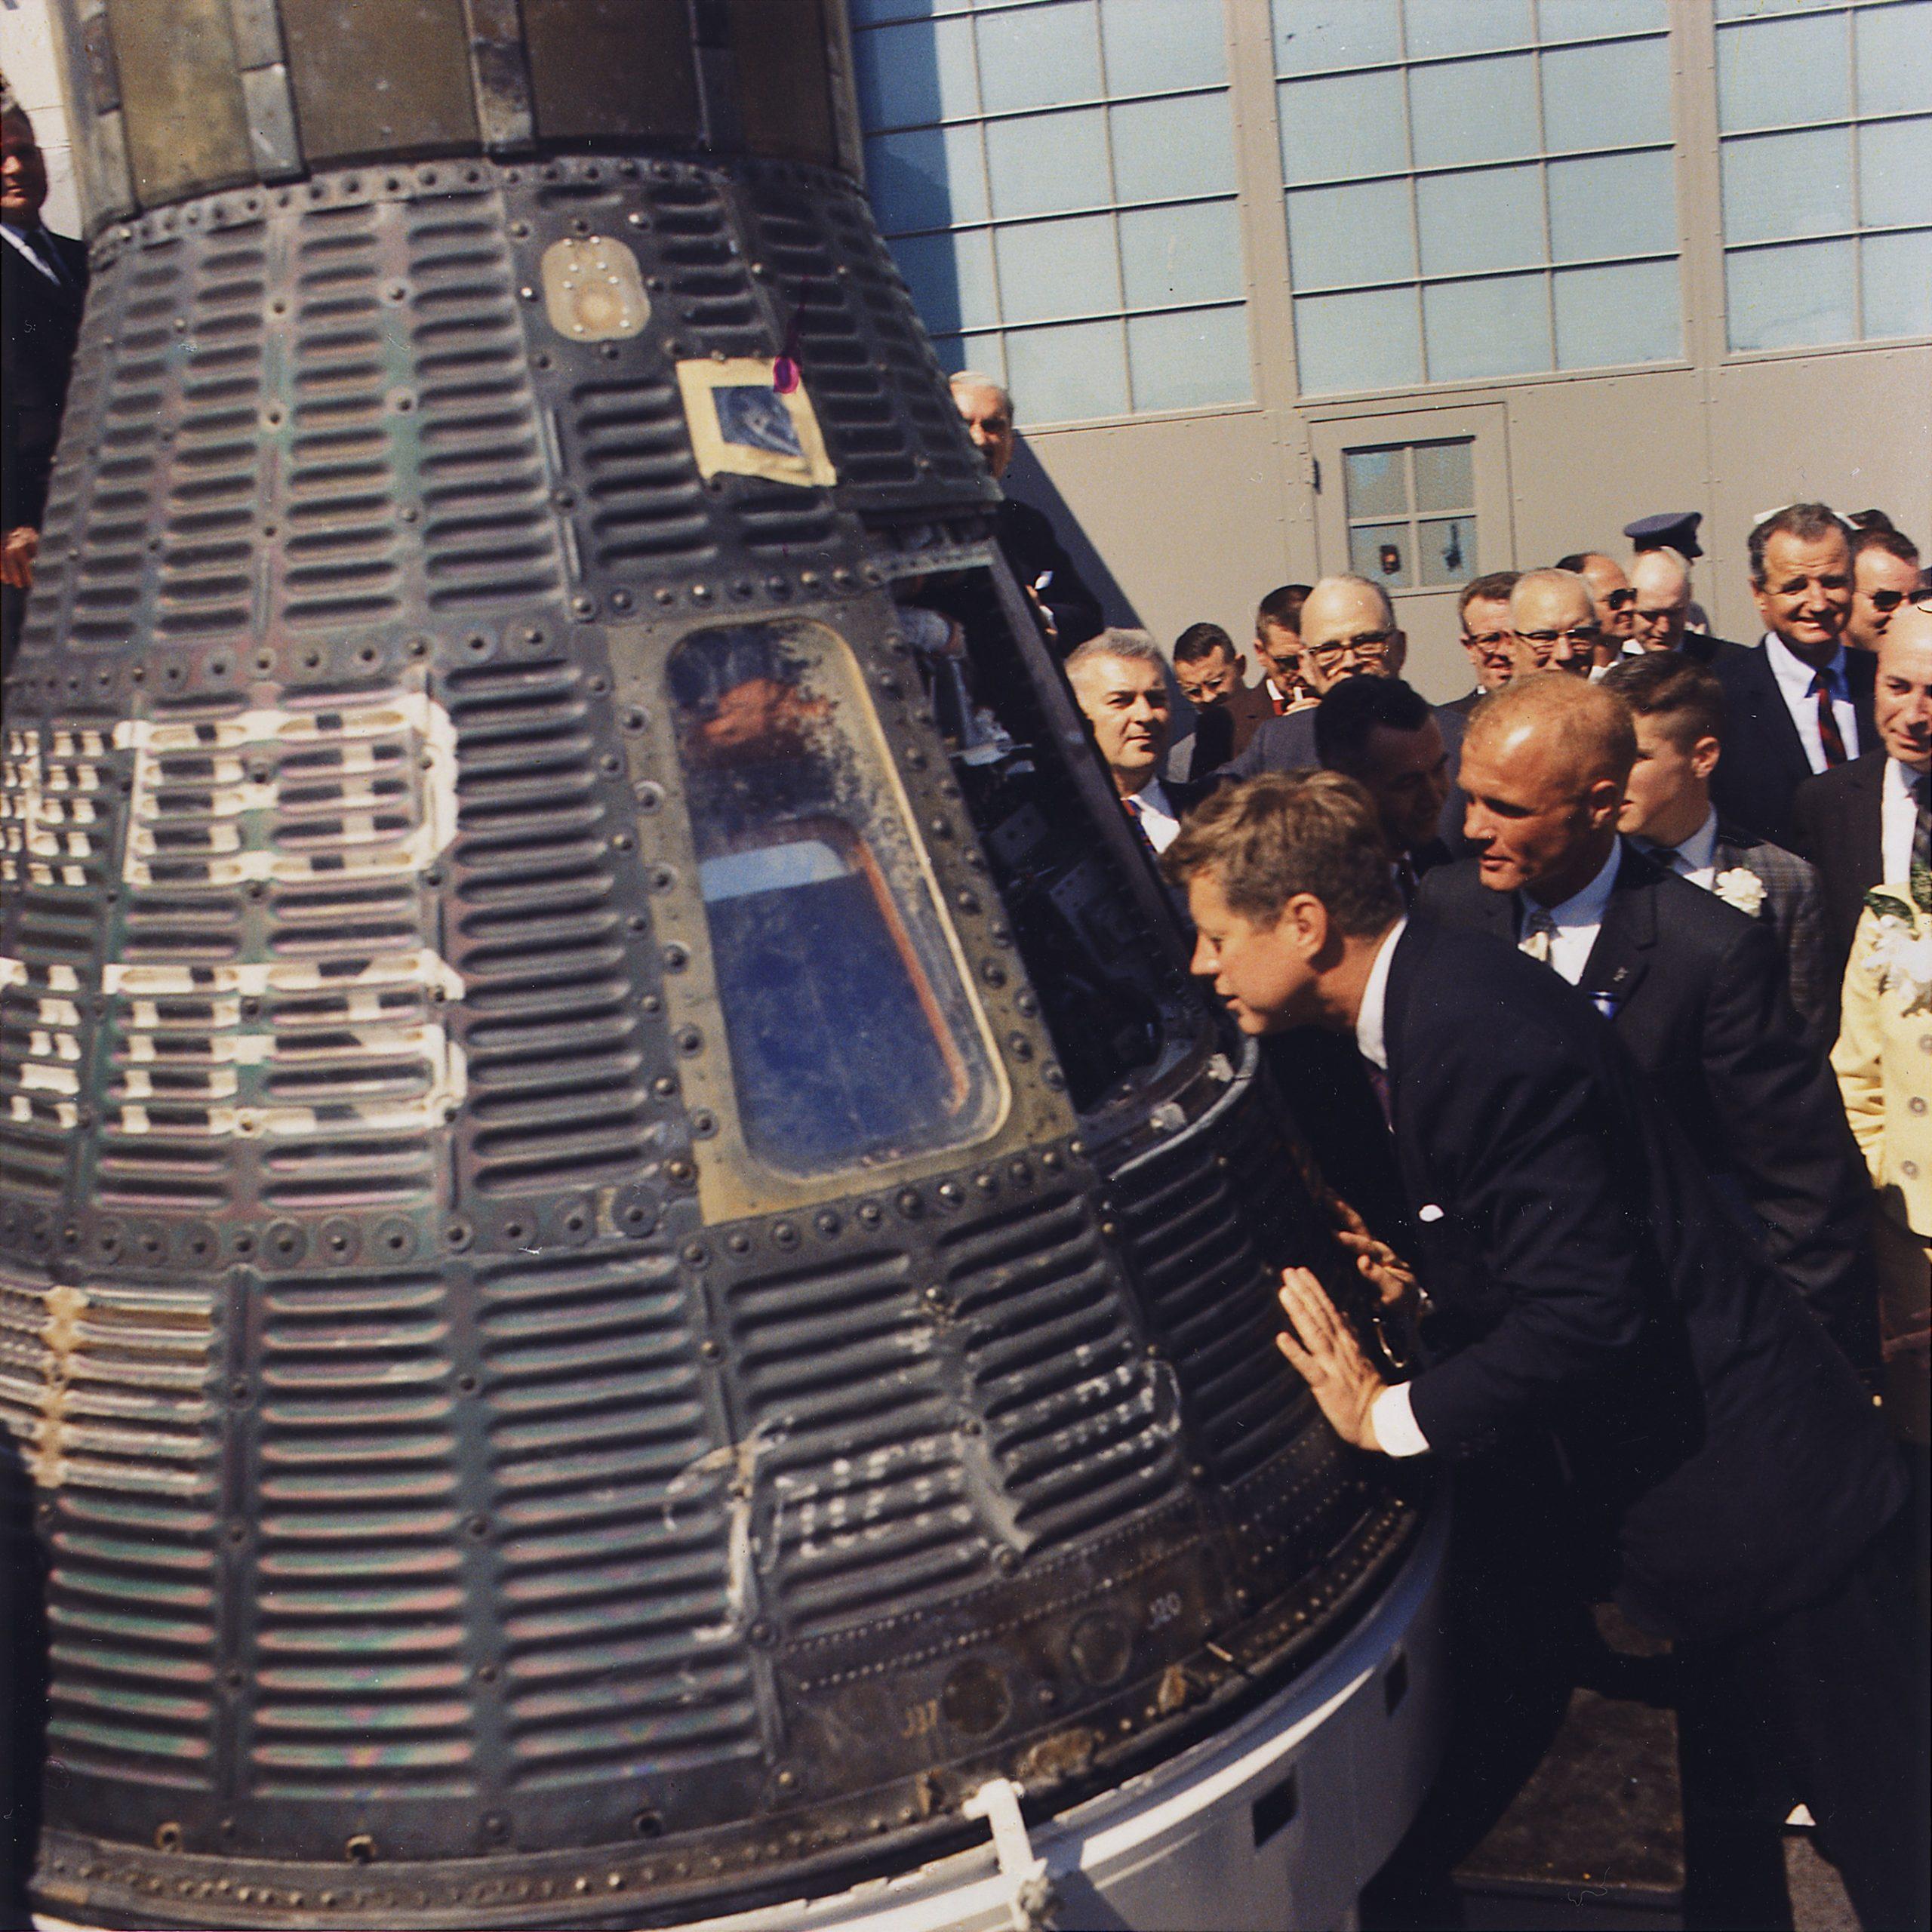 https://commons.wikimedia.org/wiki/File:JFK_inspects_Mercury_capsule,_23_February_1962.jpg